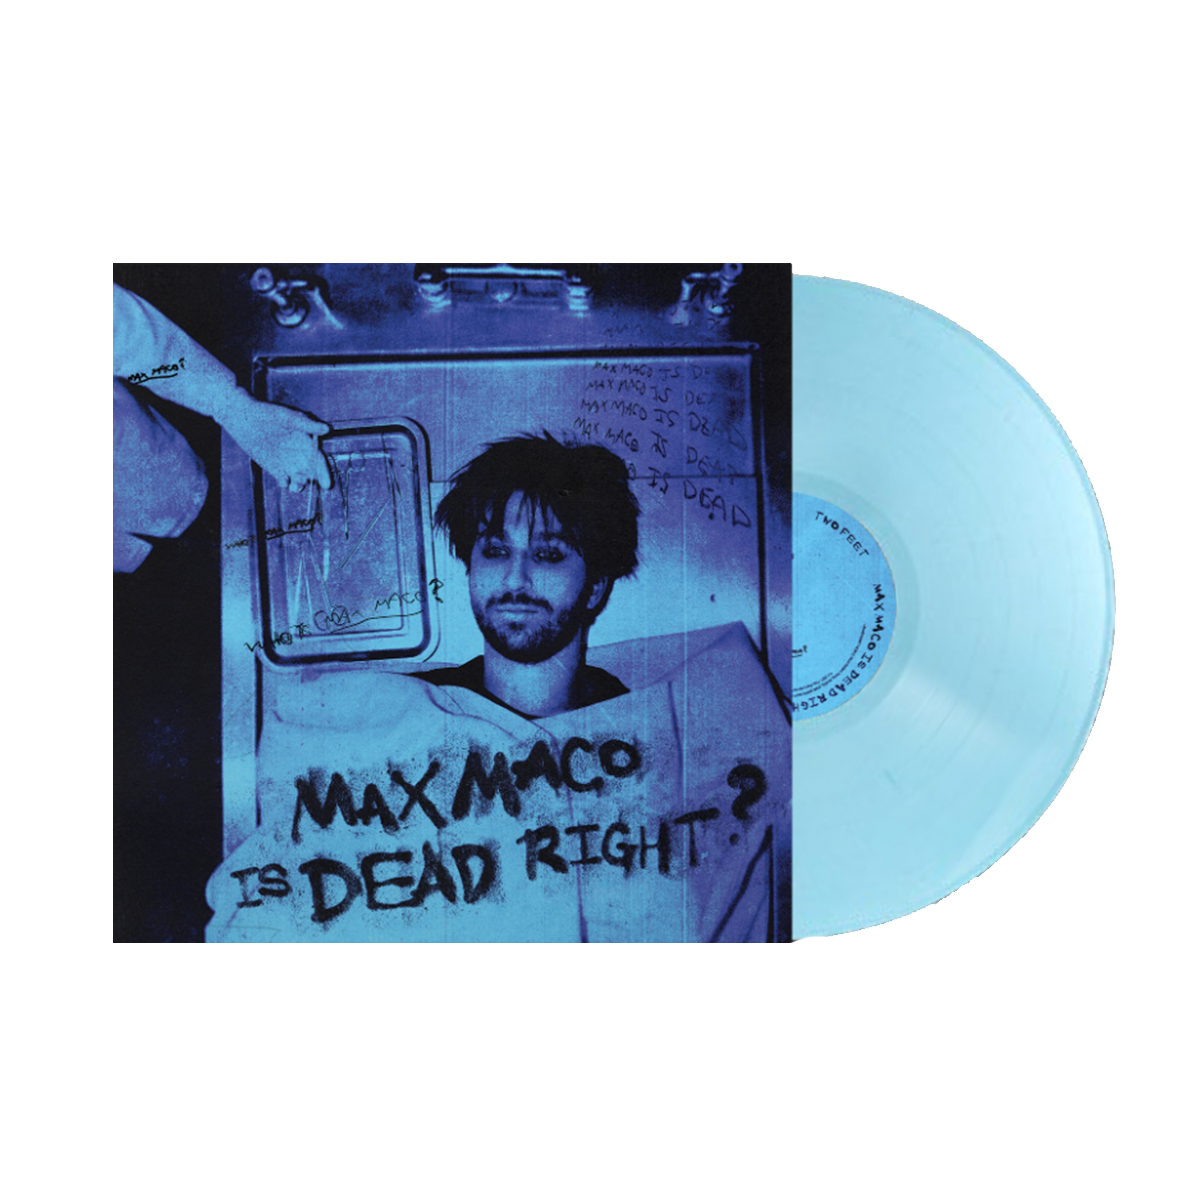 Max Maco Is Dead Right? - Opaque Light Blue Vinyl